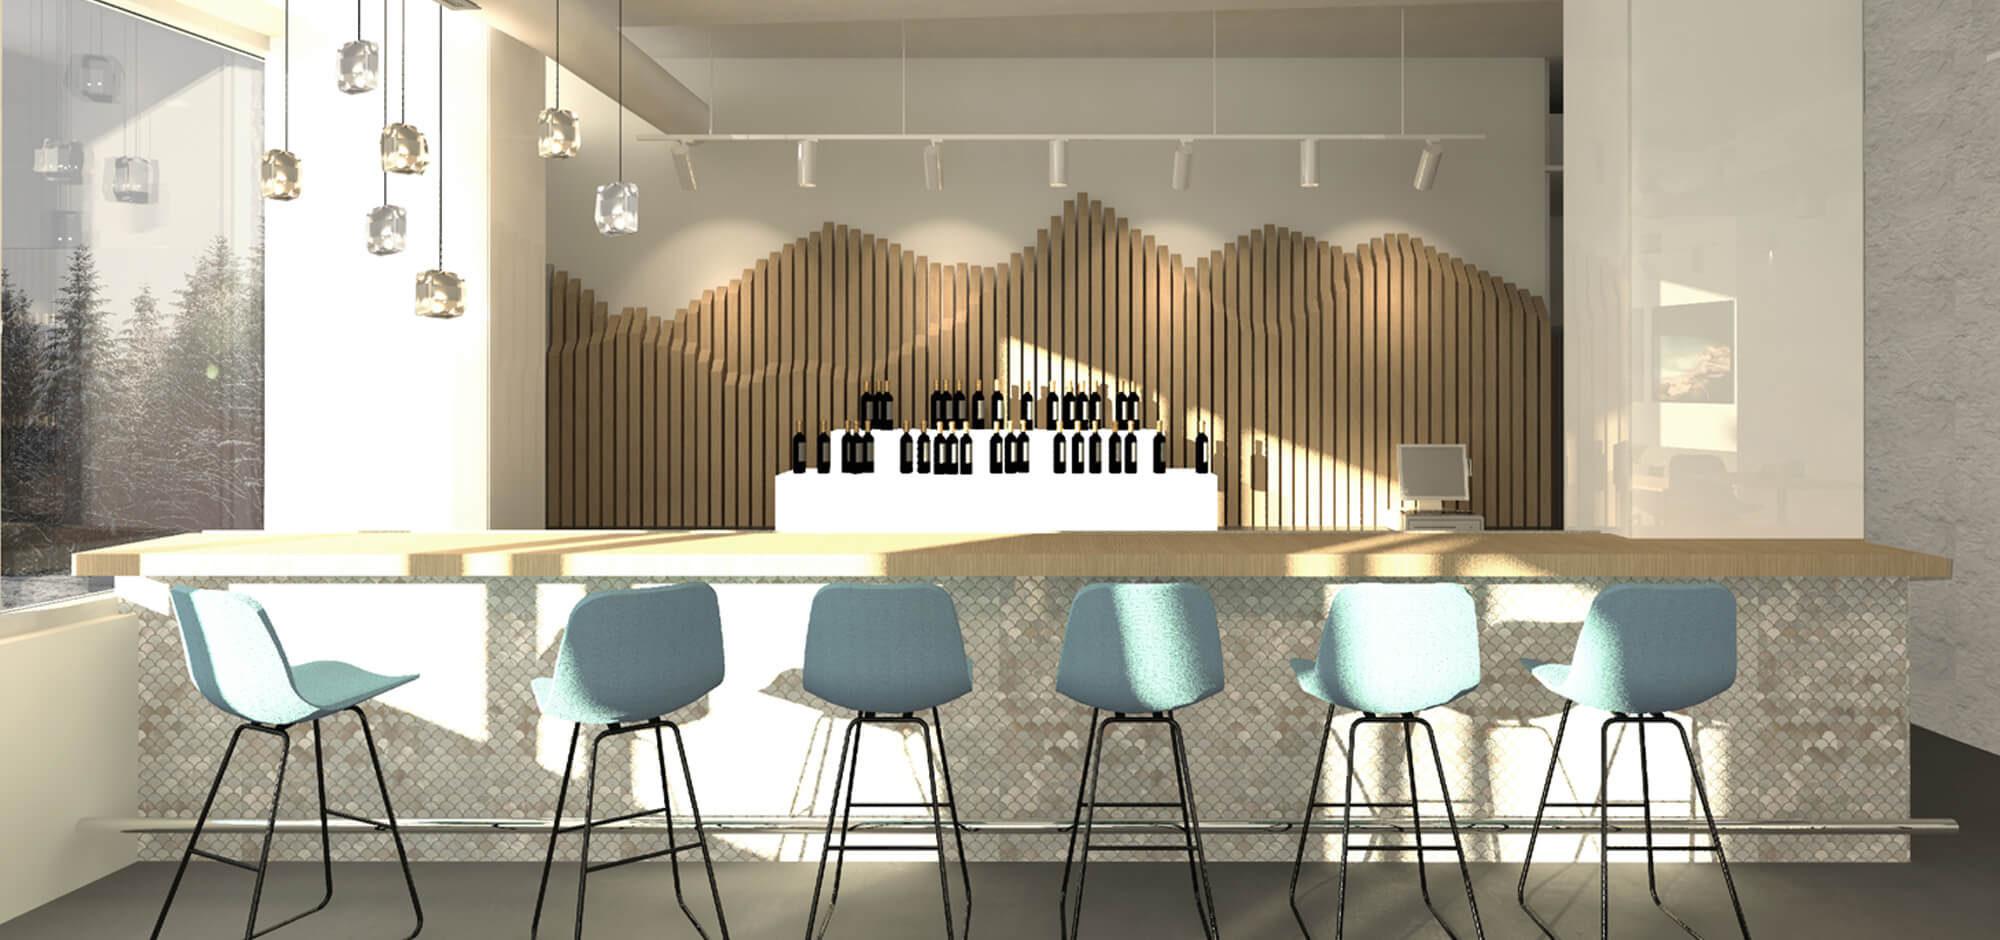 Spa Bar Design & Bar Stools